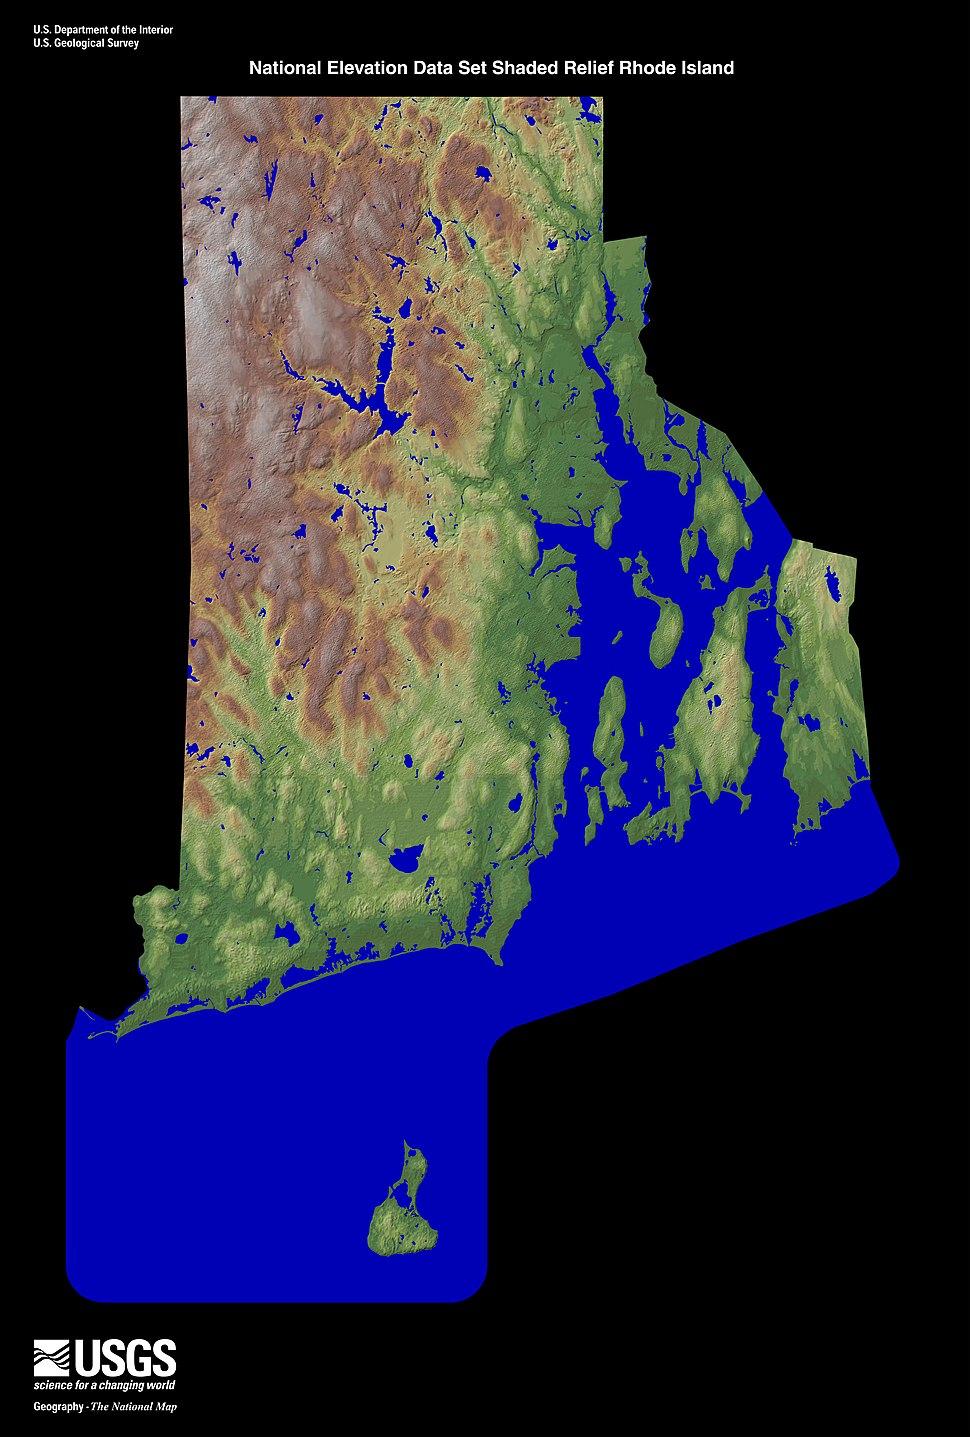 Rhode Island - NED500